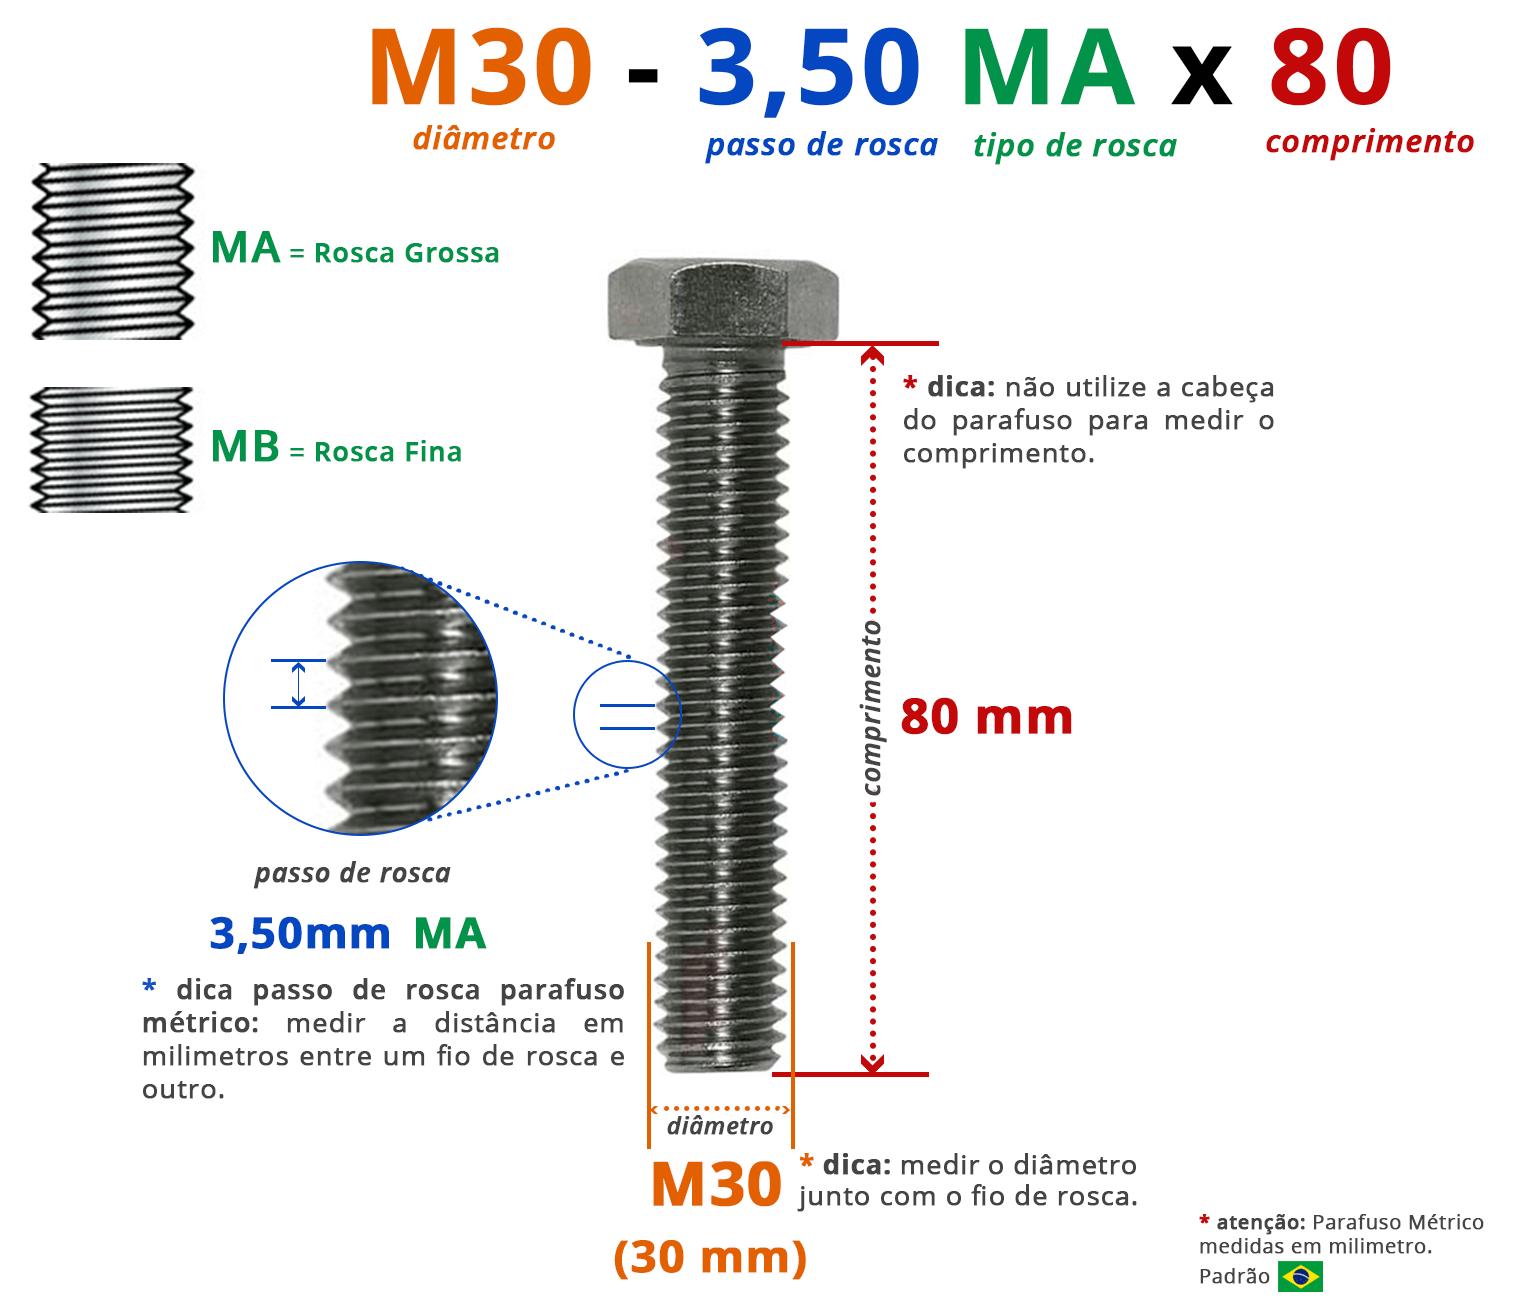 PARAFUSO SEXTAVADO ROSCA INTEIRA M30 3,50 MA X 80 DIN 933 INOX A4